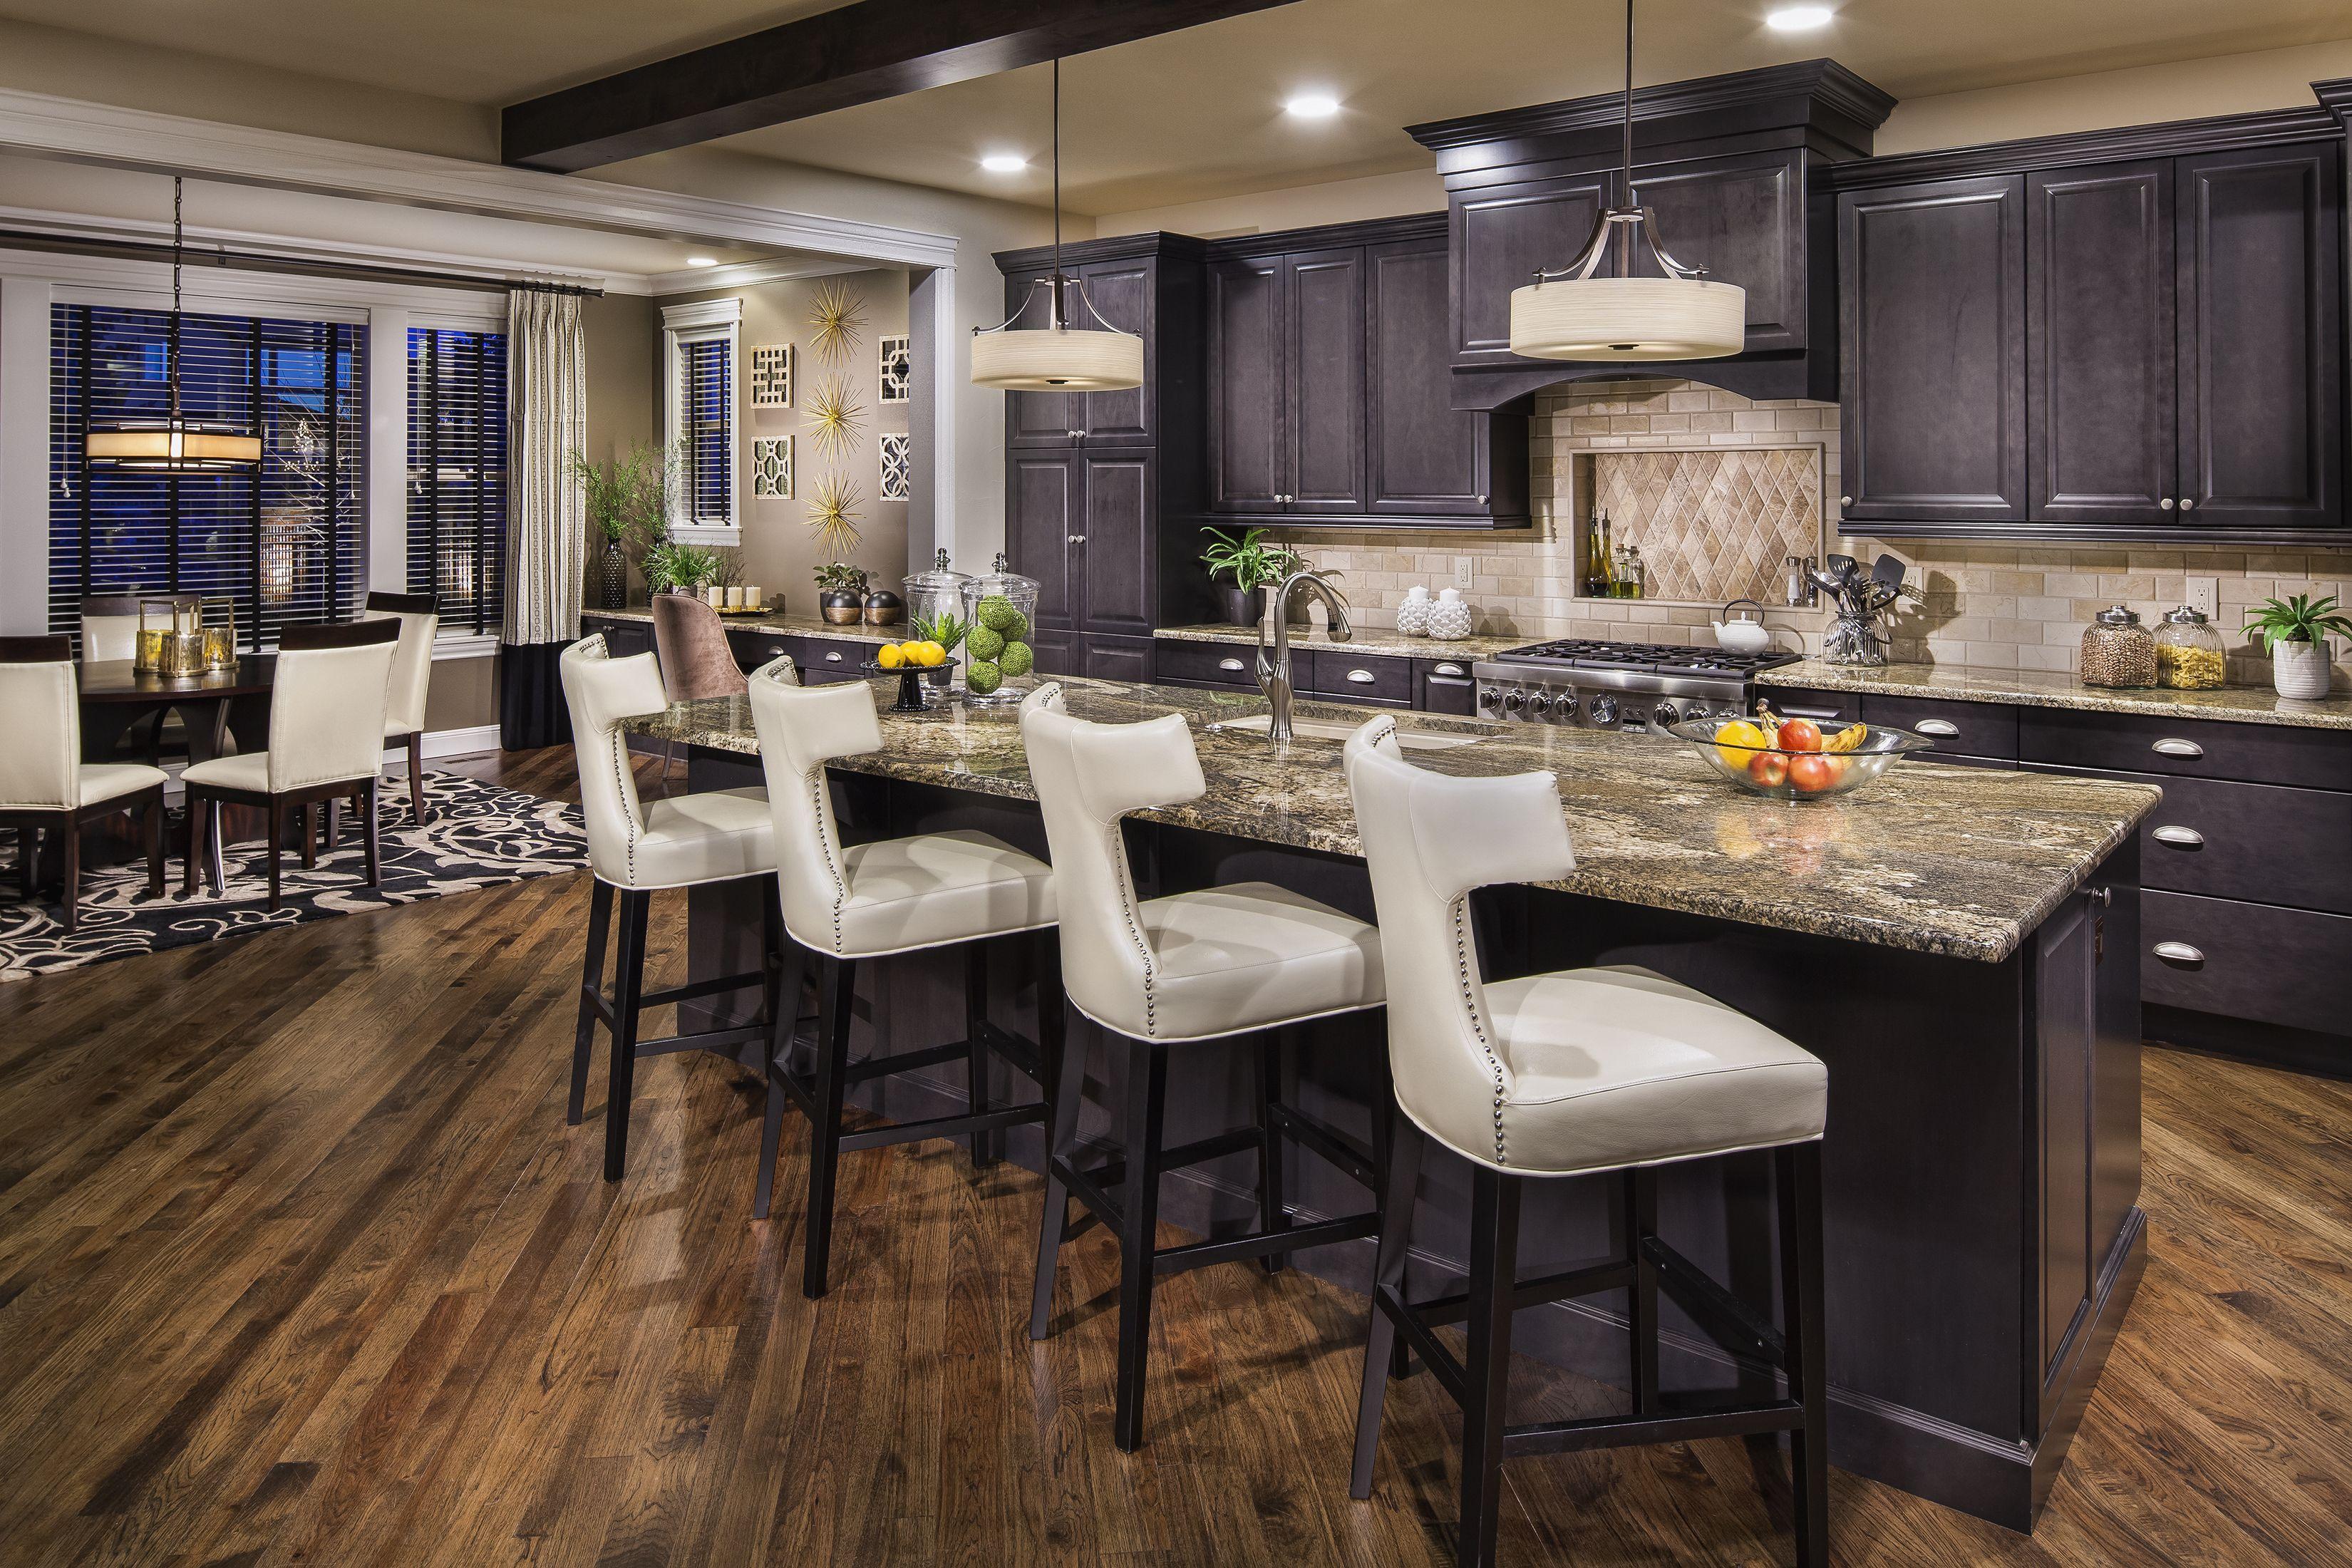 berardi residence kitchen custom interior design luxury interior rh in pinterest com Commercial Interior Design Denver Denver Studio 10 Interior Design